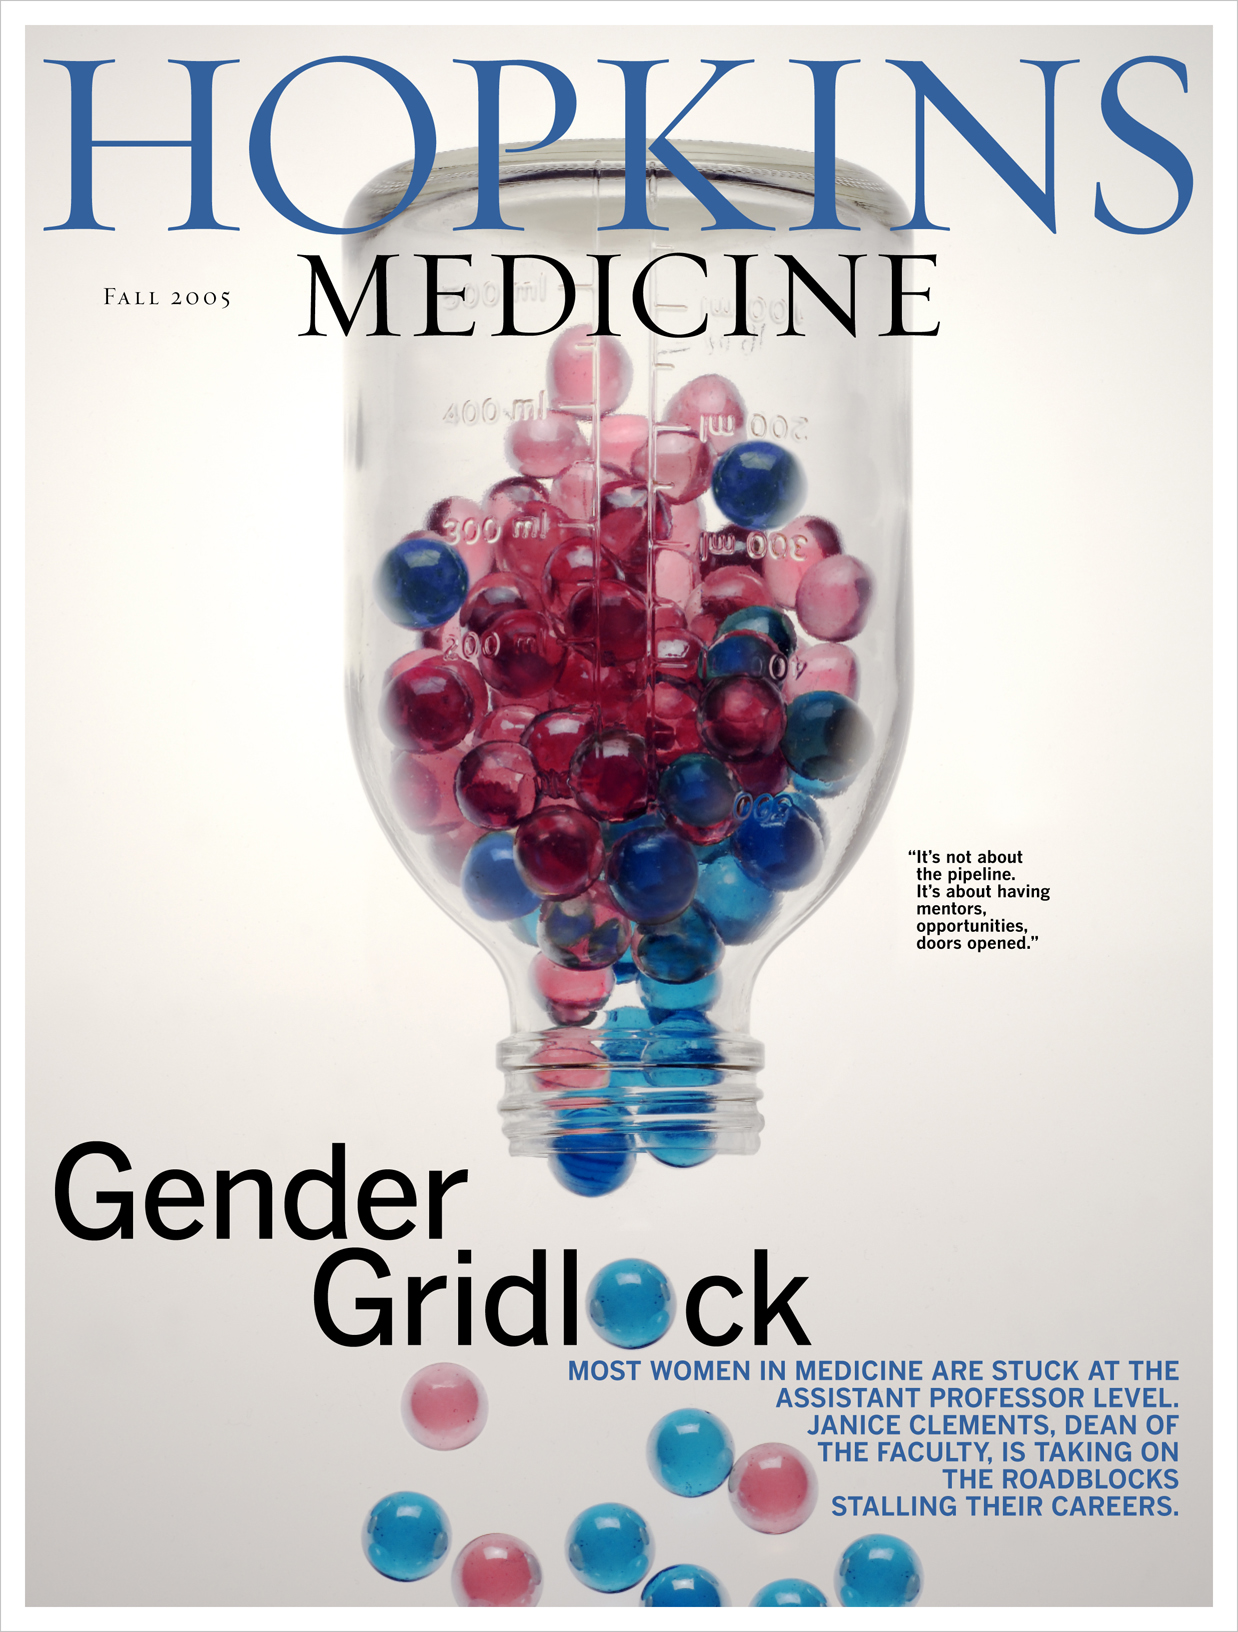 JHM_2004-COVER05.jpg